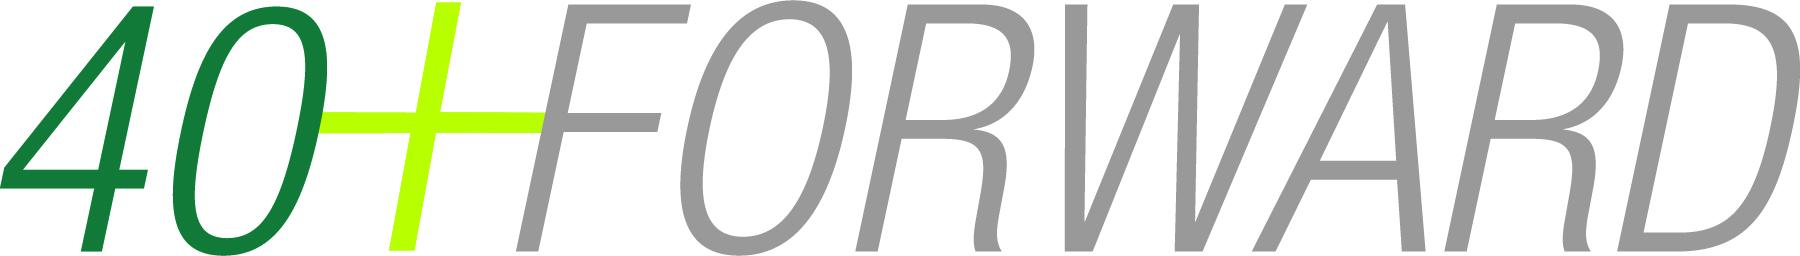 GU4-Forward_logo_final_cmyk.jpg